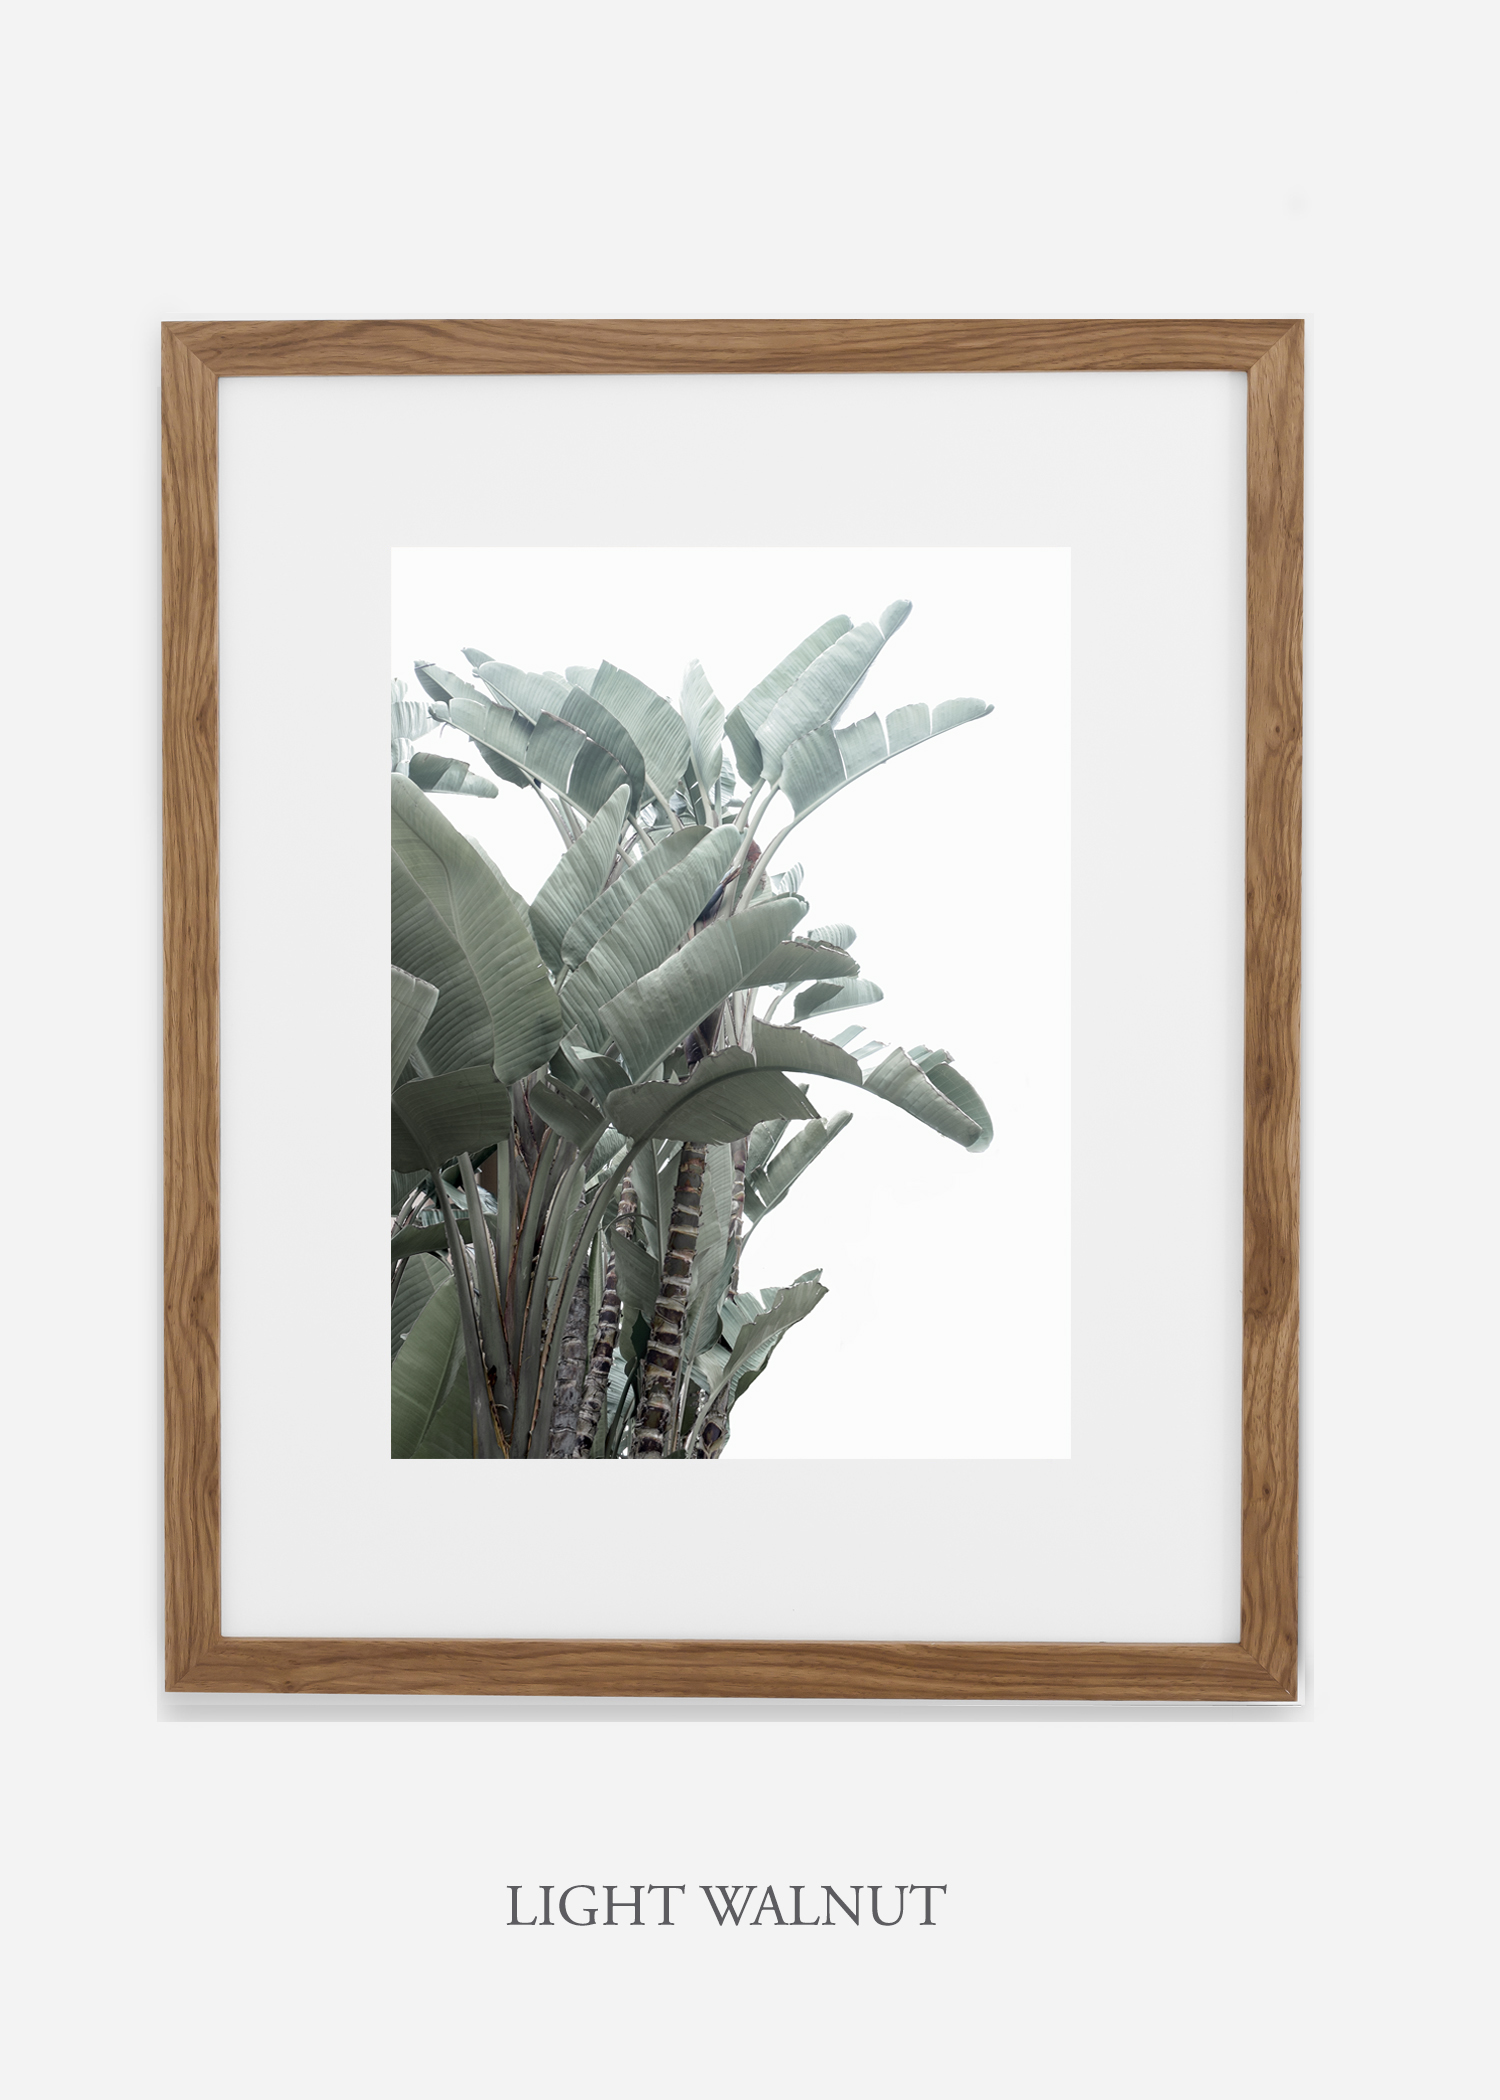 wildercalifornia_lightwalnutframe_WinterWhite_BananaLeafNo.1_Tropical_LosAngeles_Art_HomeDecor_interiordesign_design.jpg